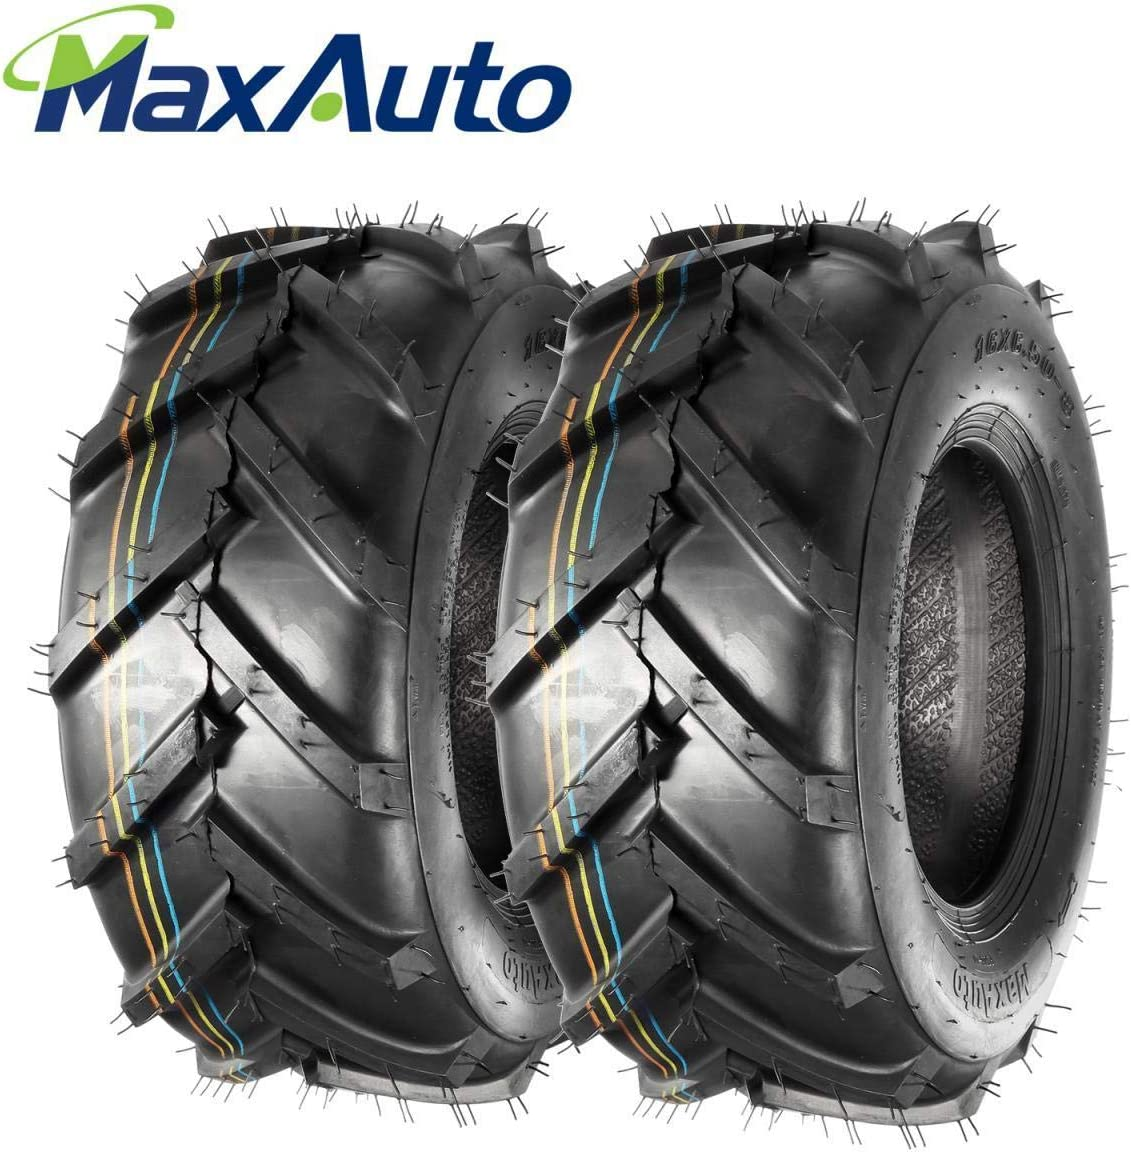 MaxAuto Super Lug Lawn /& Garden Tire 16x6.50-8 4PR